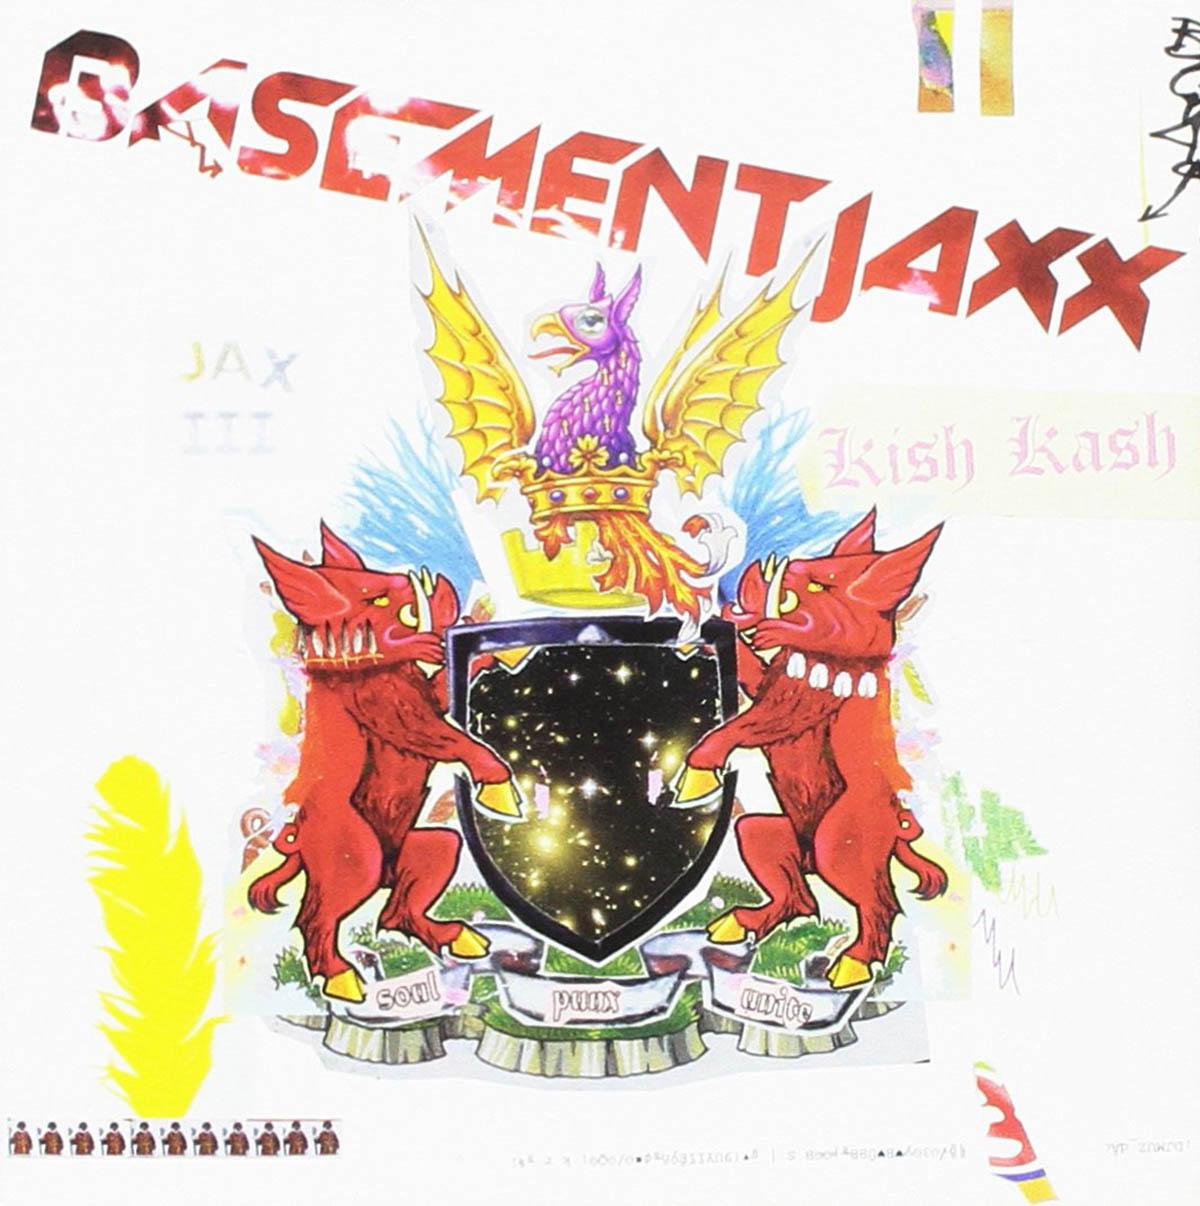 Basement Jaxx, Kish Kash